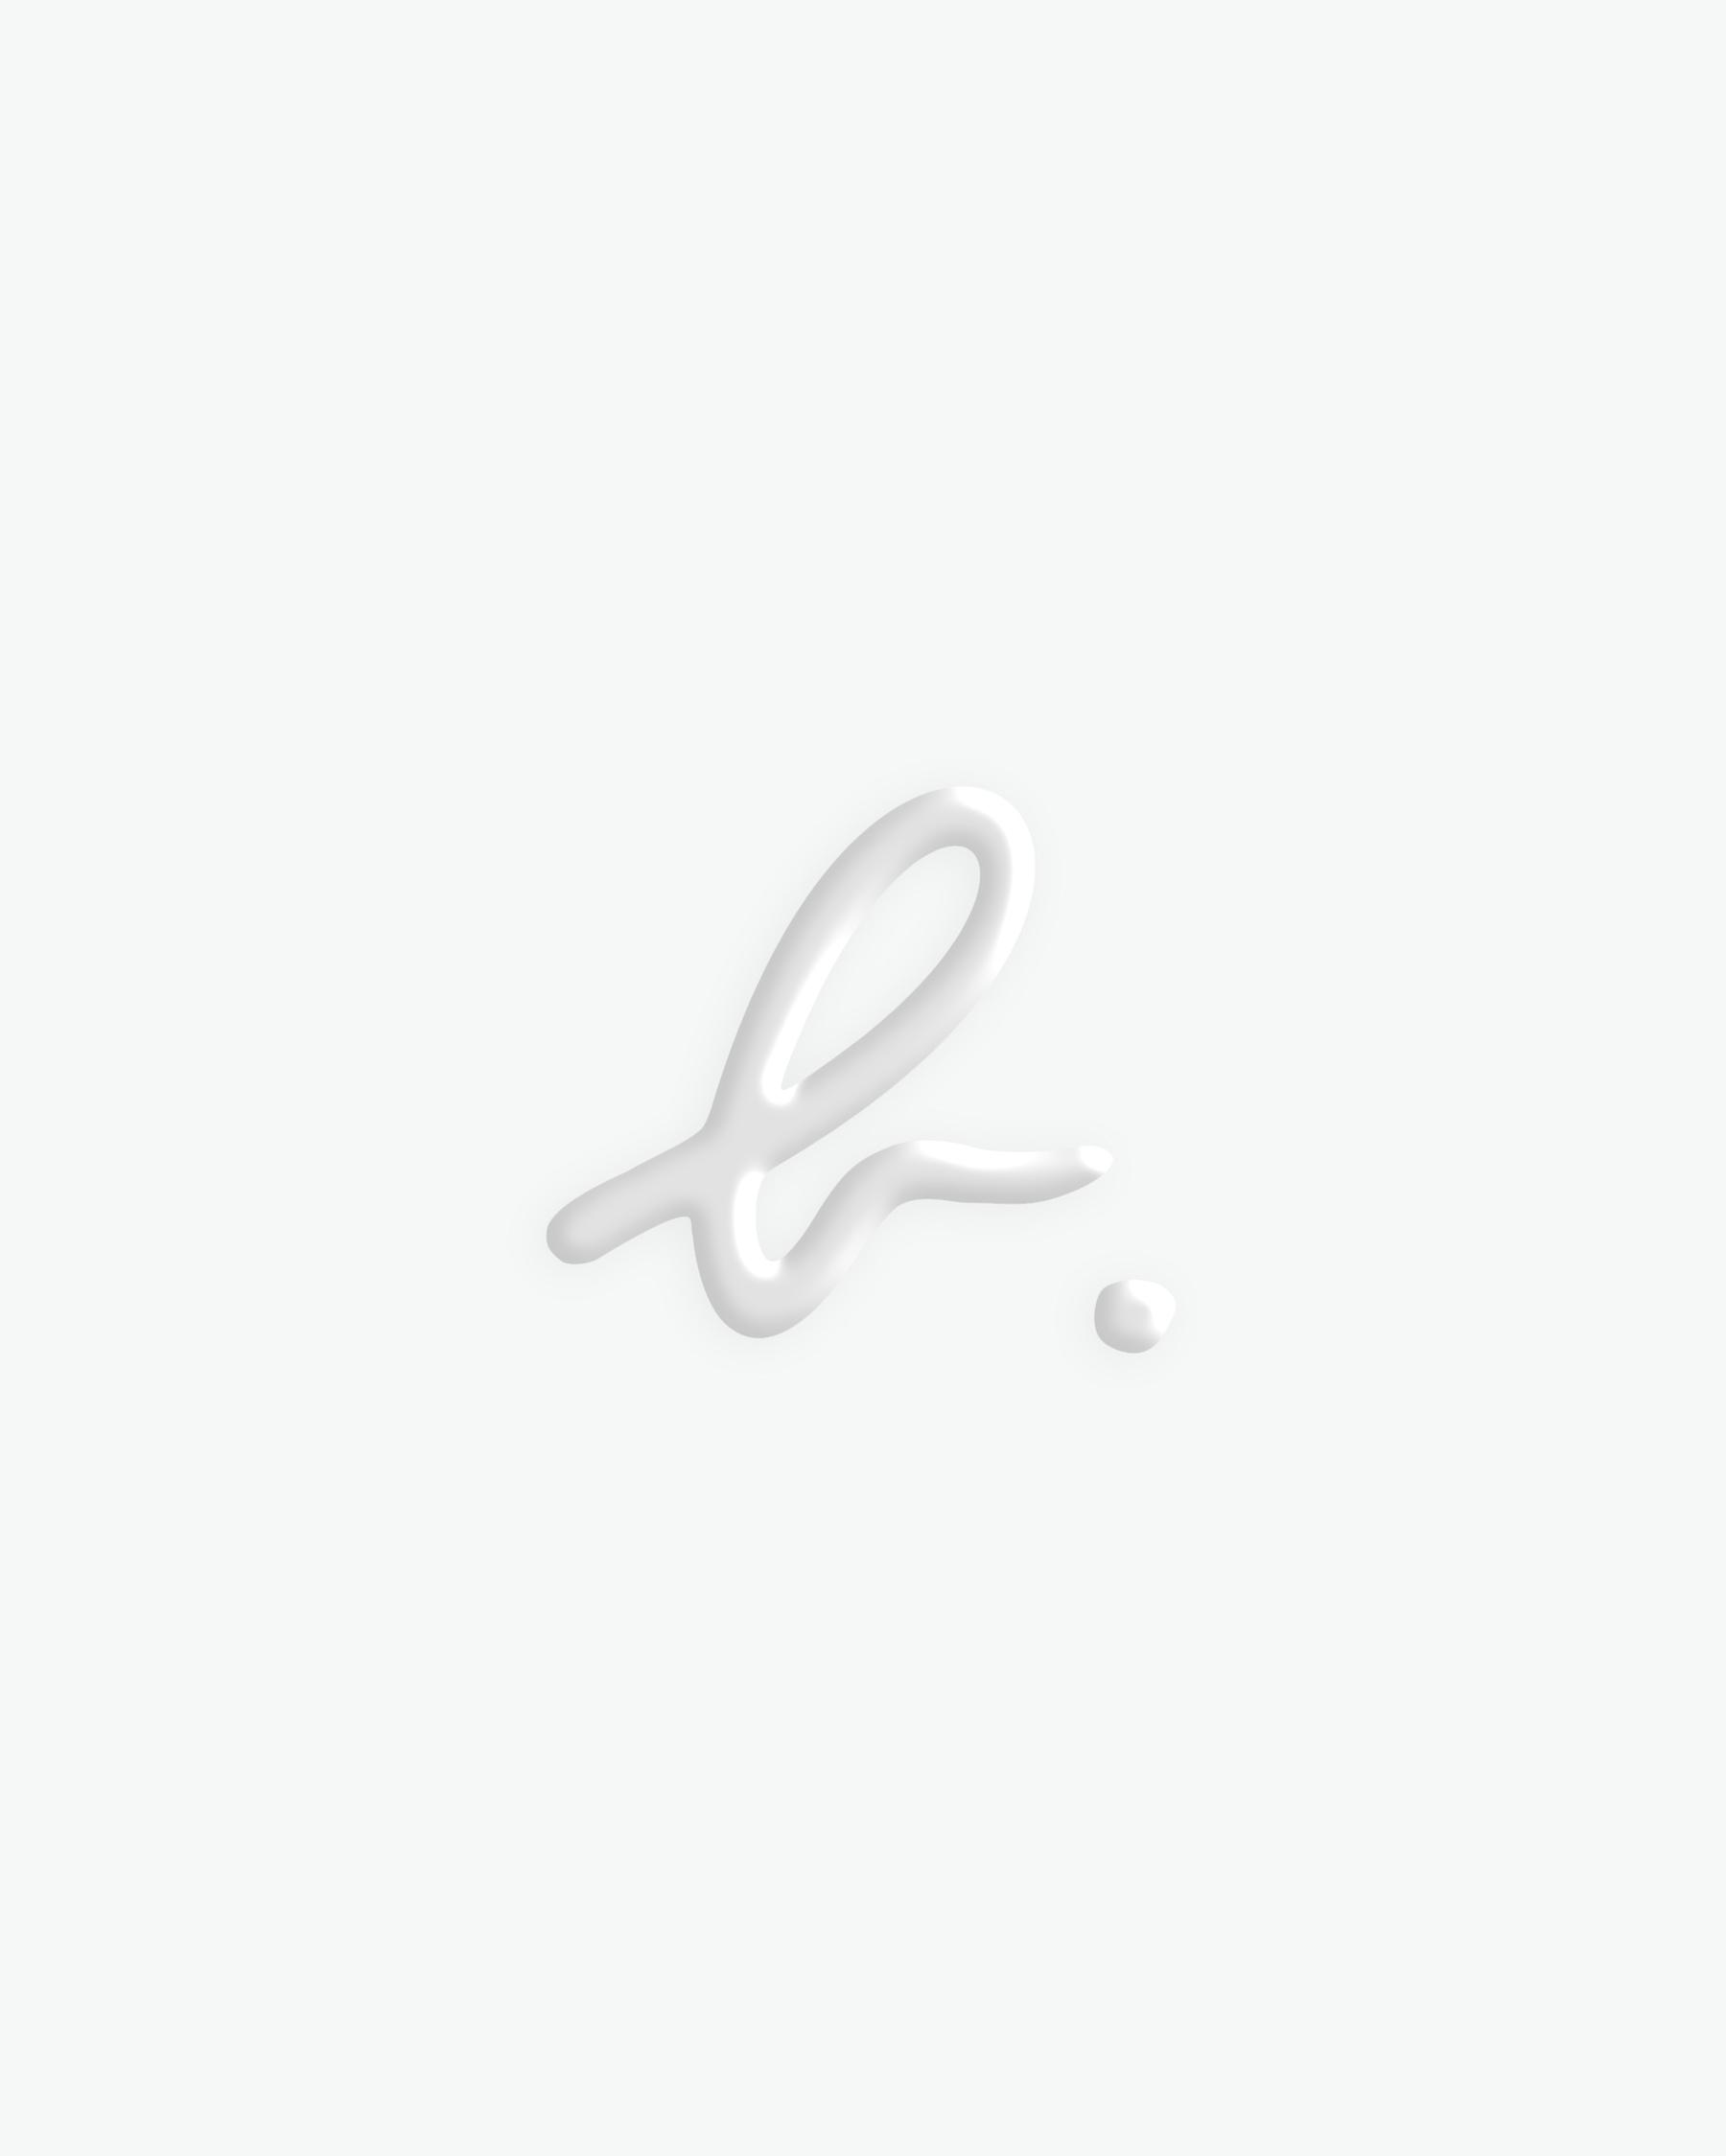 agnesb-photographe-malvina-alves-cover